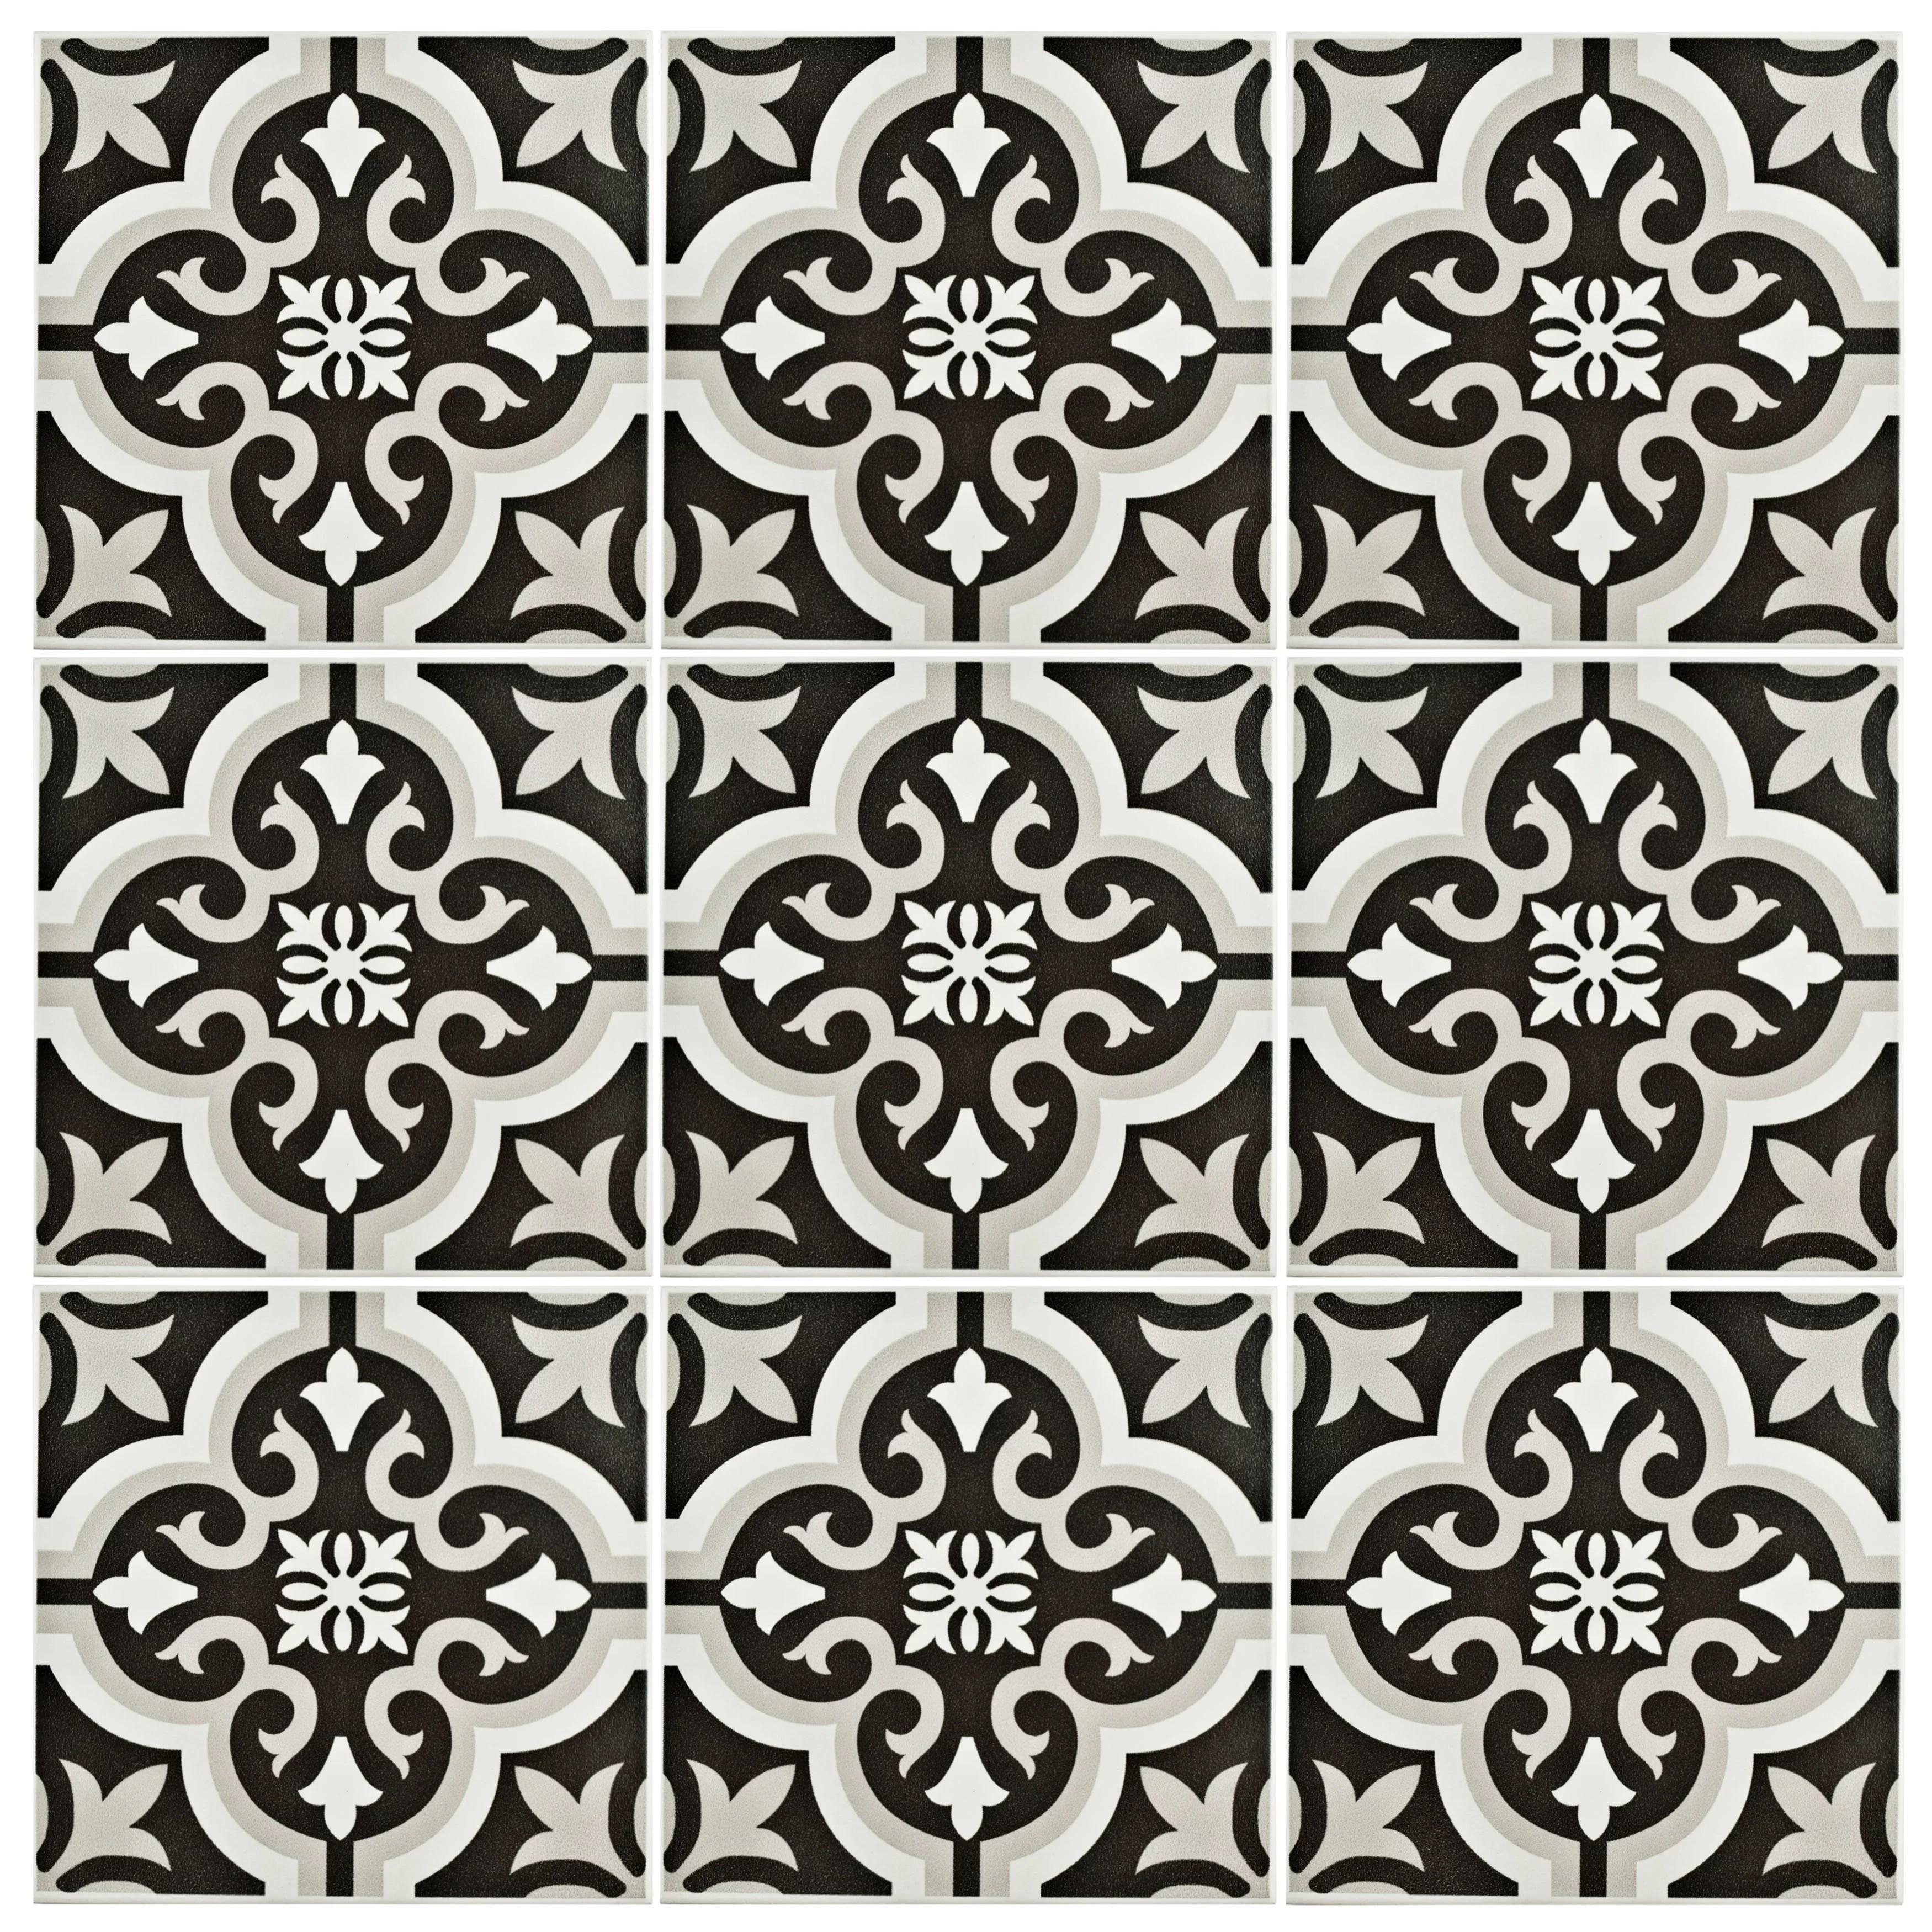 Fall Wallpaper Border Elitetile Lima 7 75 Quot X 7 75 Quot Ceramic Field Tile In Classic